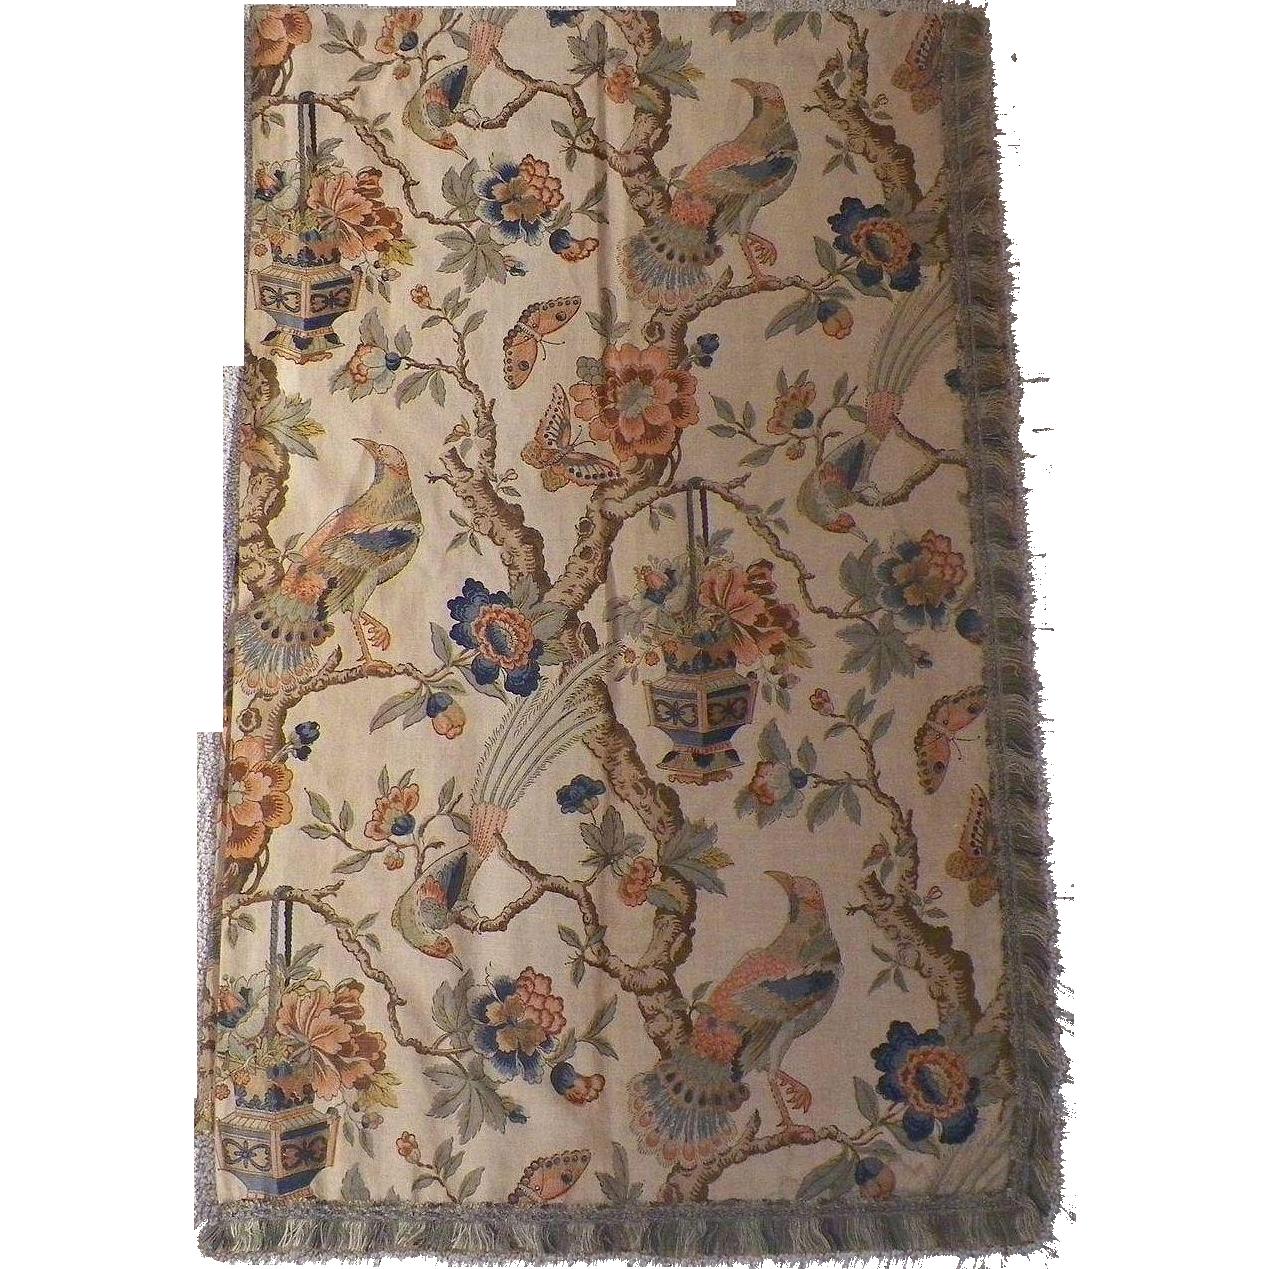 Pair Of Vintage Natural Linen Drapery Curtain Panels Asian Motif